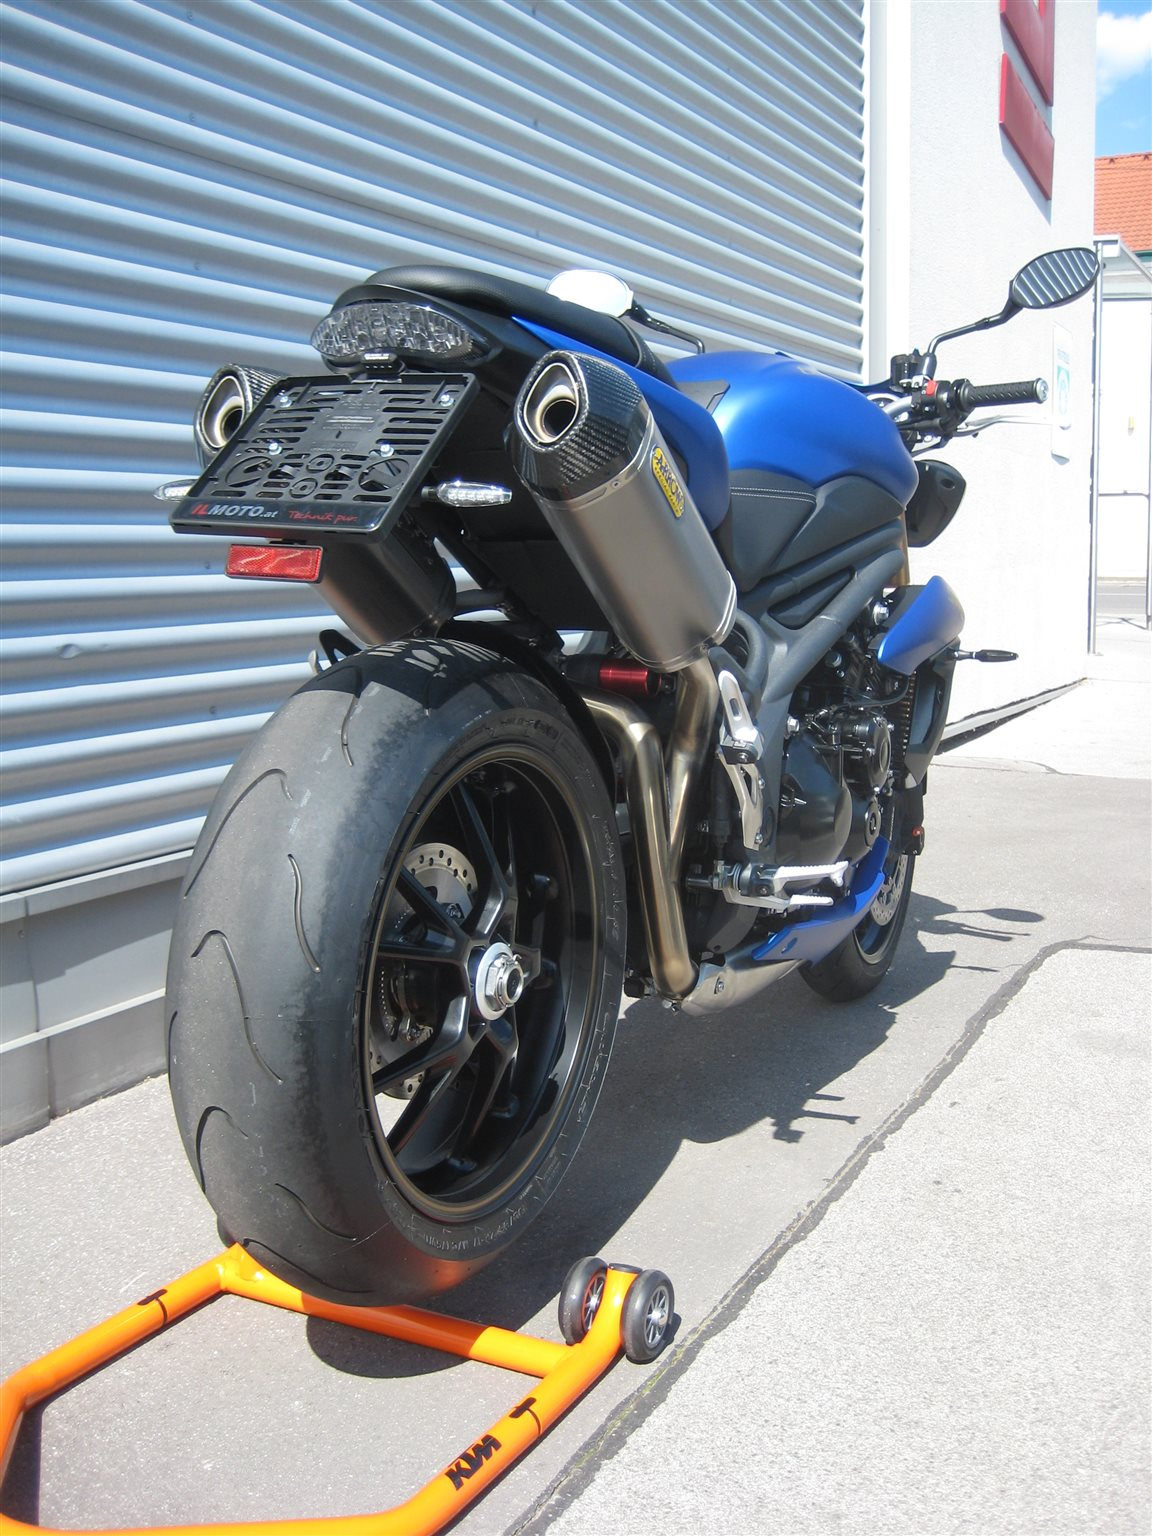 umgebautes motorrad triumph speed triple 1050 von il moto gesmbh. Black Bedroom Furniture Sets. Home Design Ideas